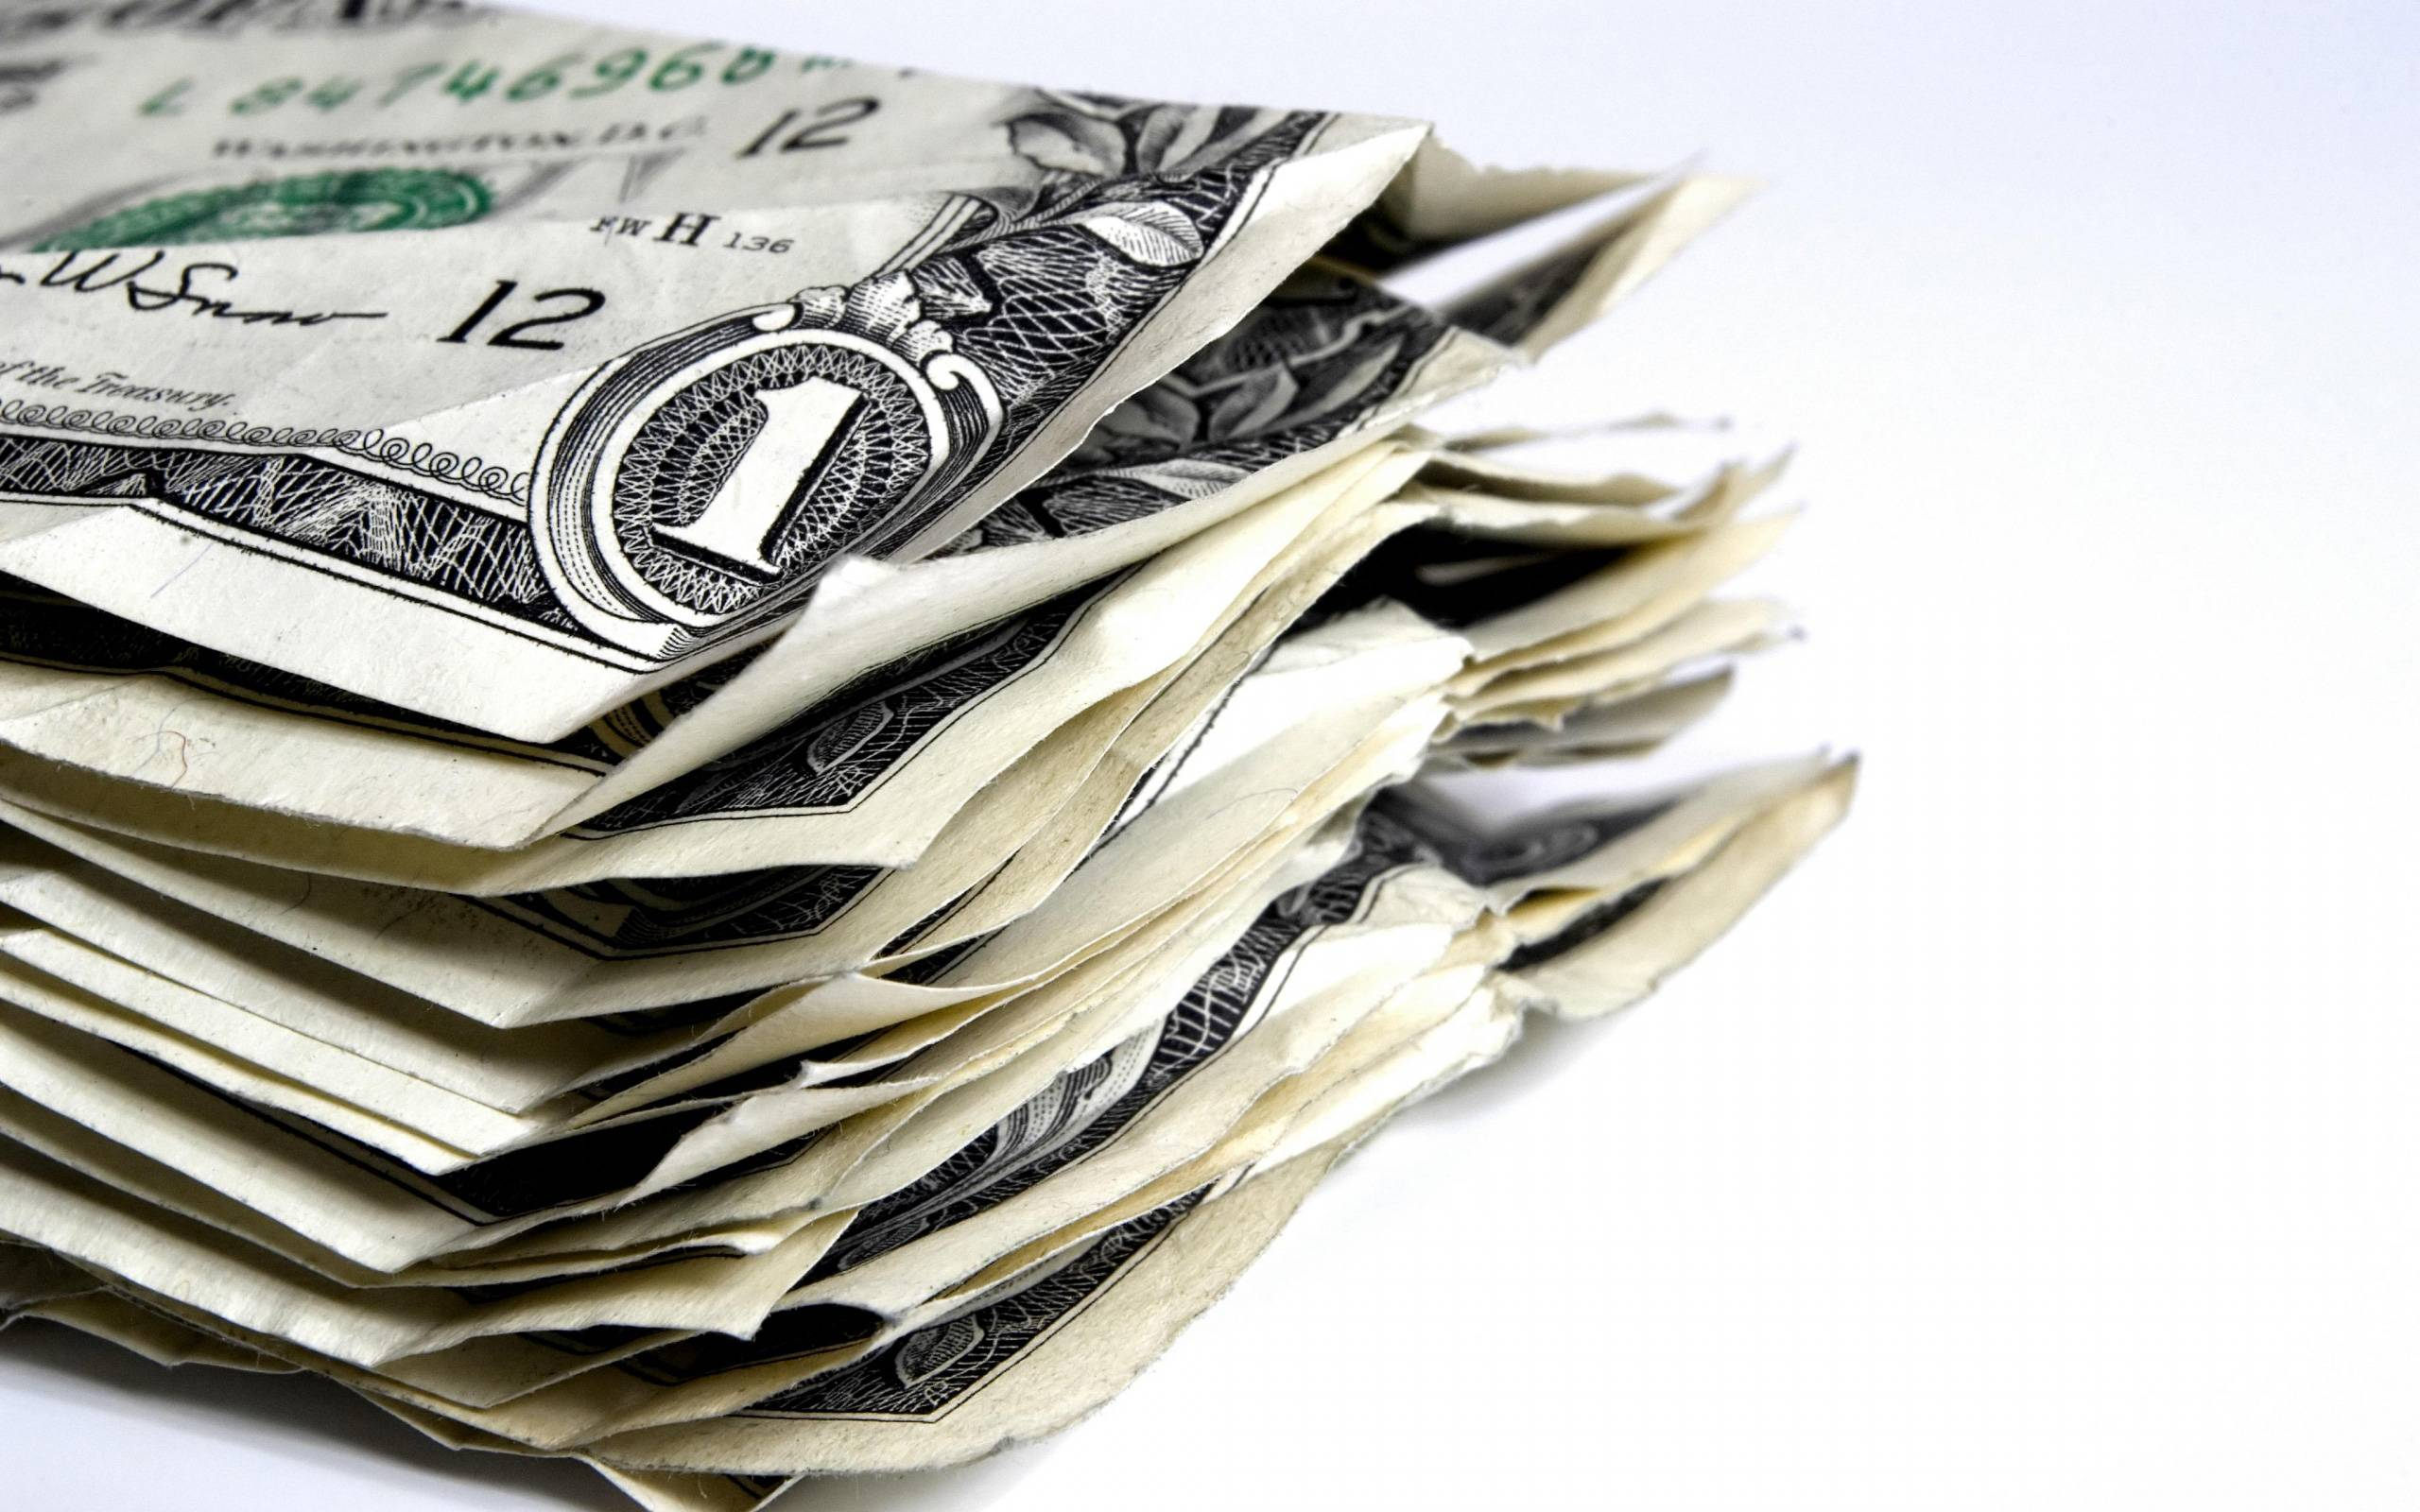 money-0c197ad677a3f8b62ac5fb0921d48b92.jpg